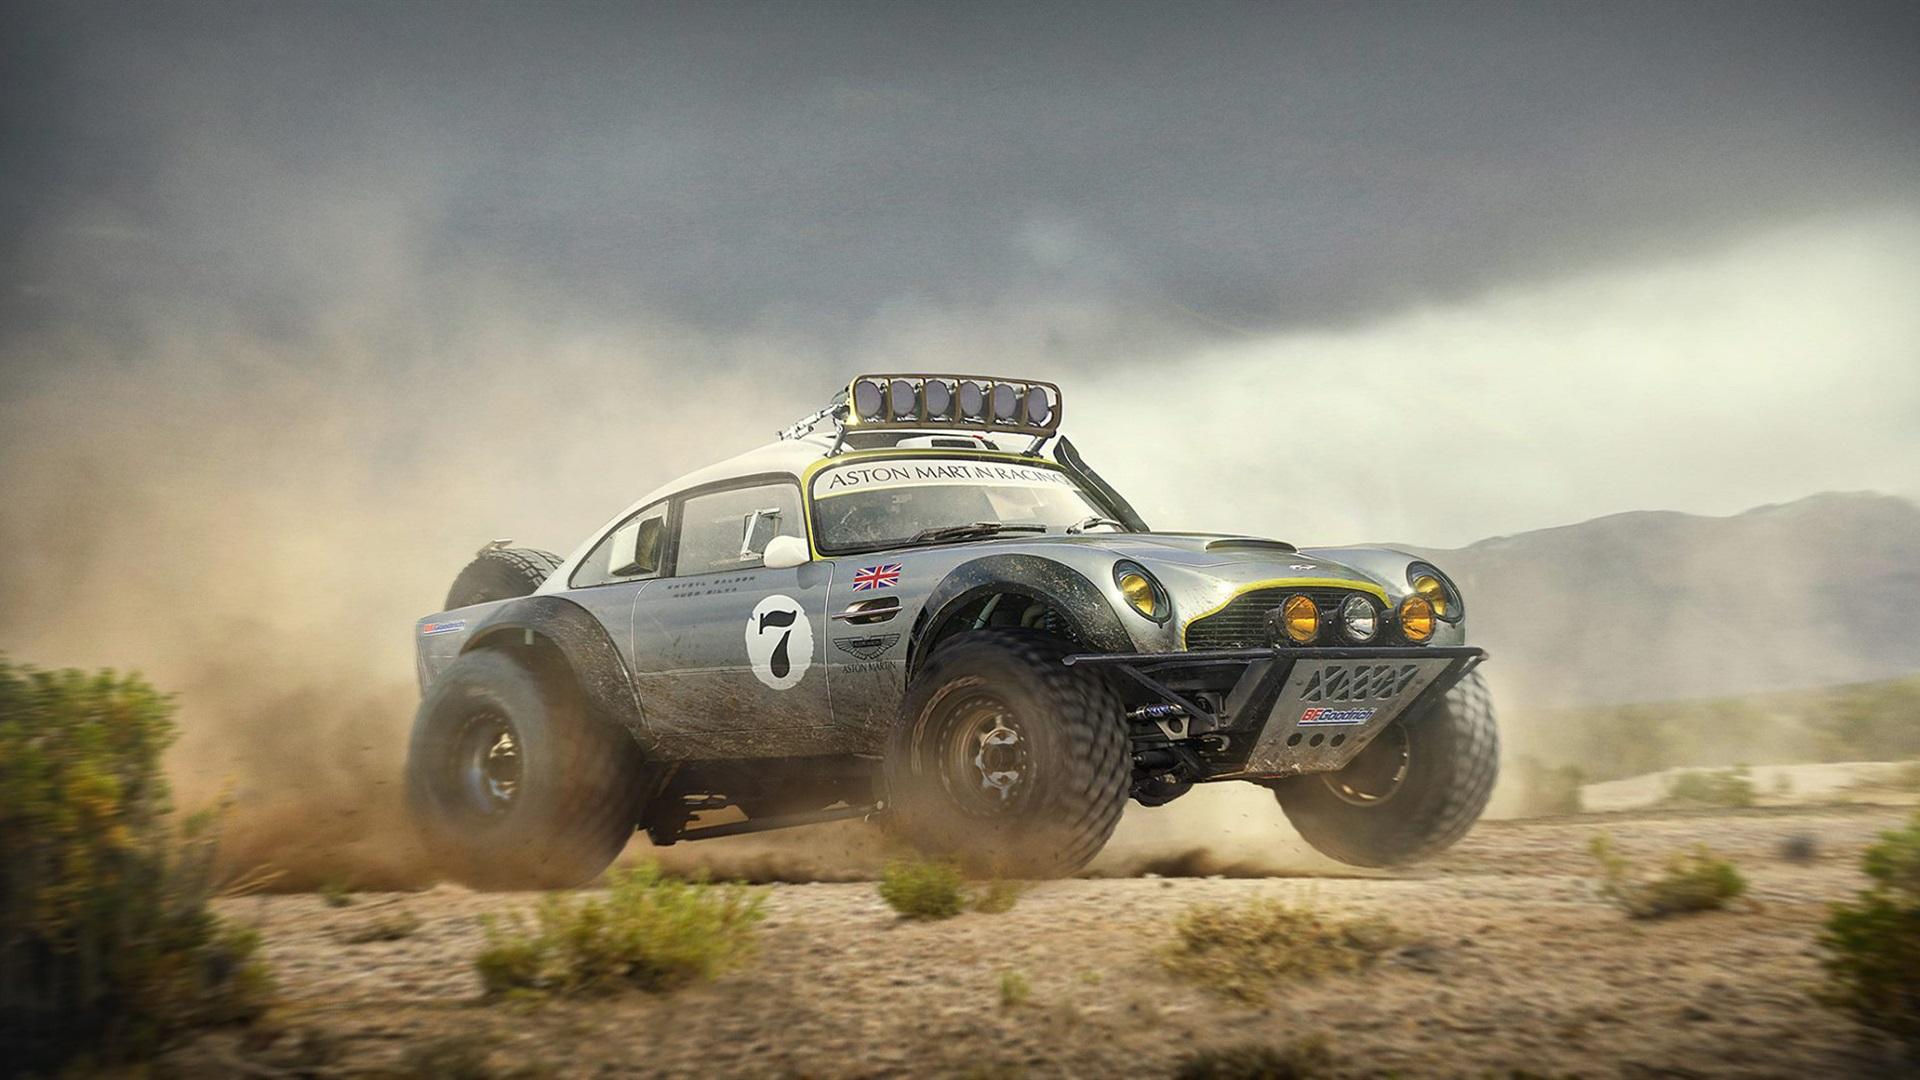 Aston Martin Db5 Off Road Car Dakar Race 4k Uhd Wallpaper